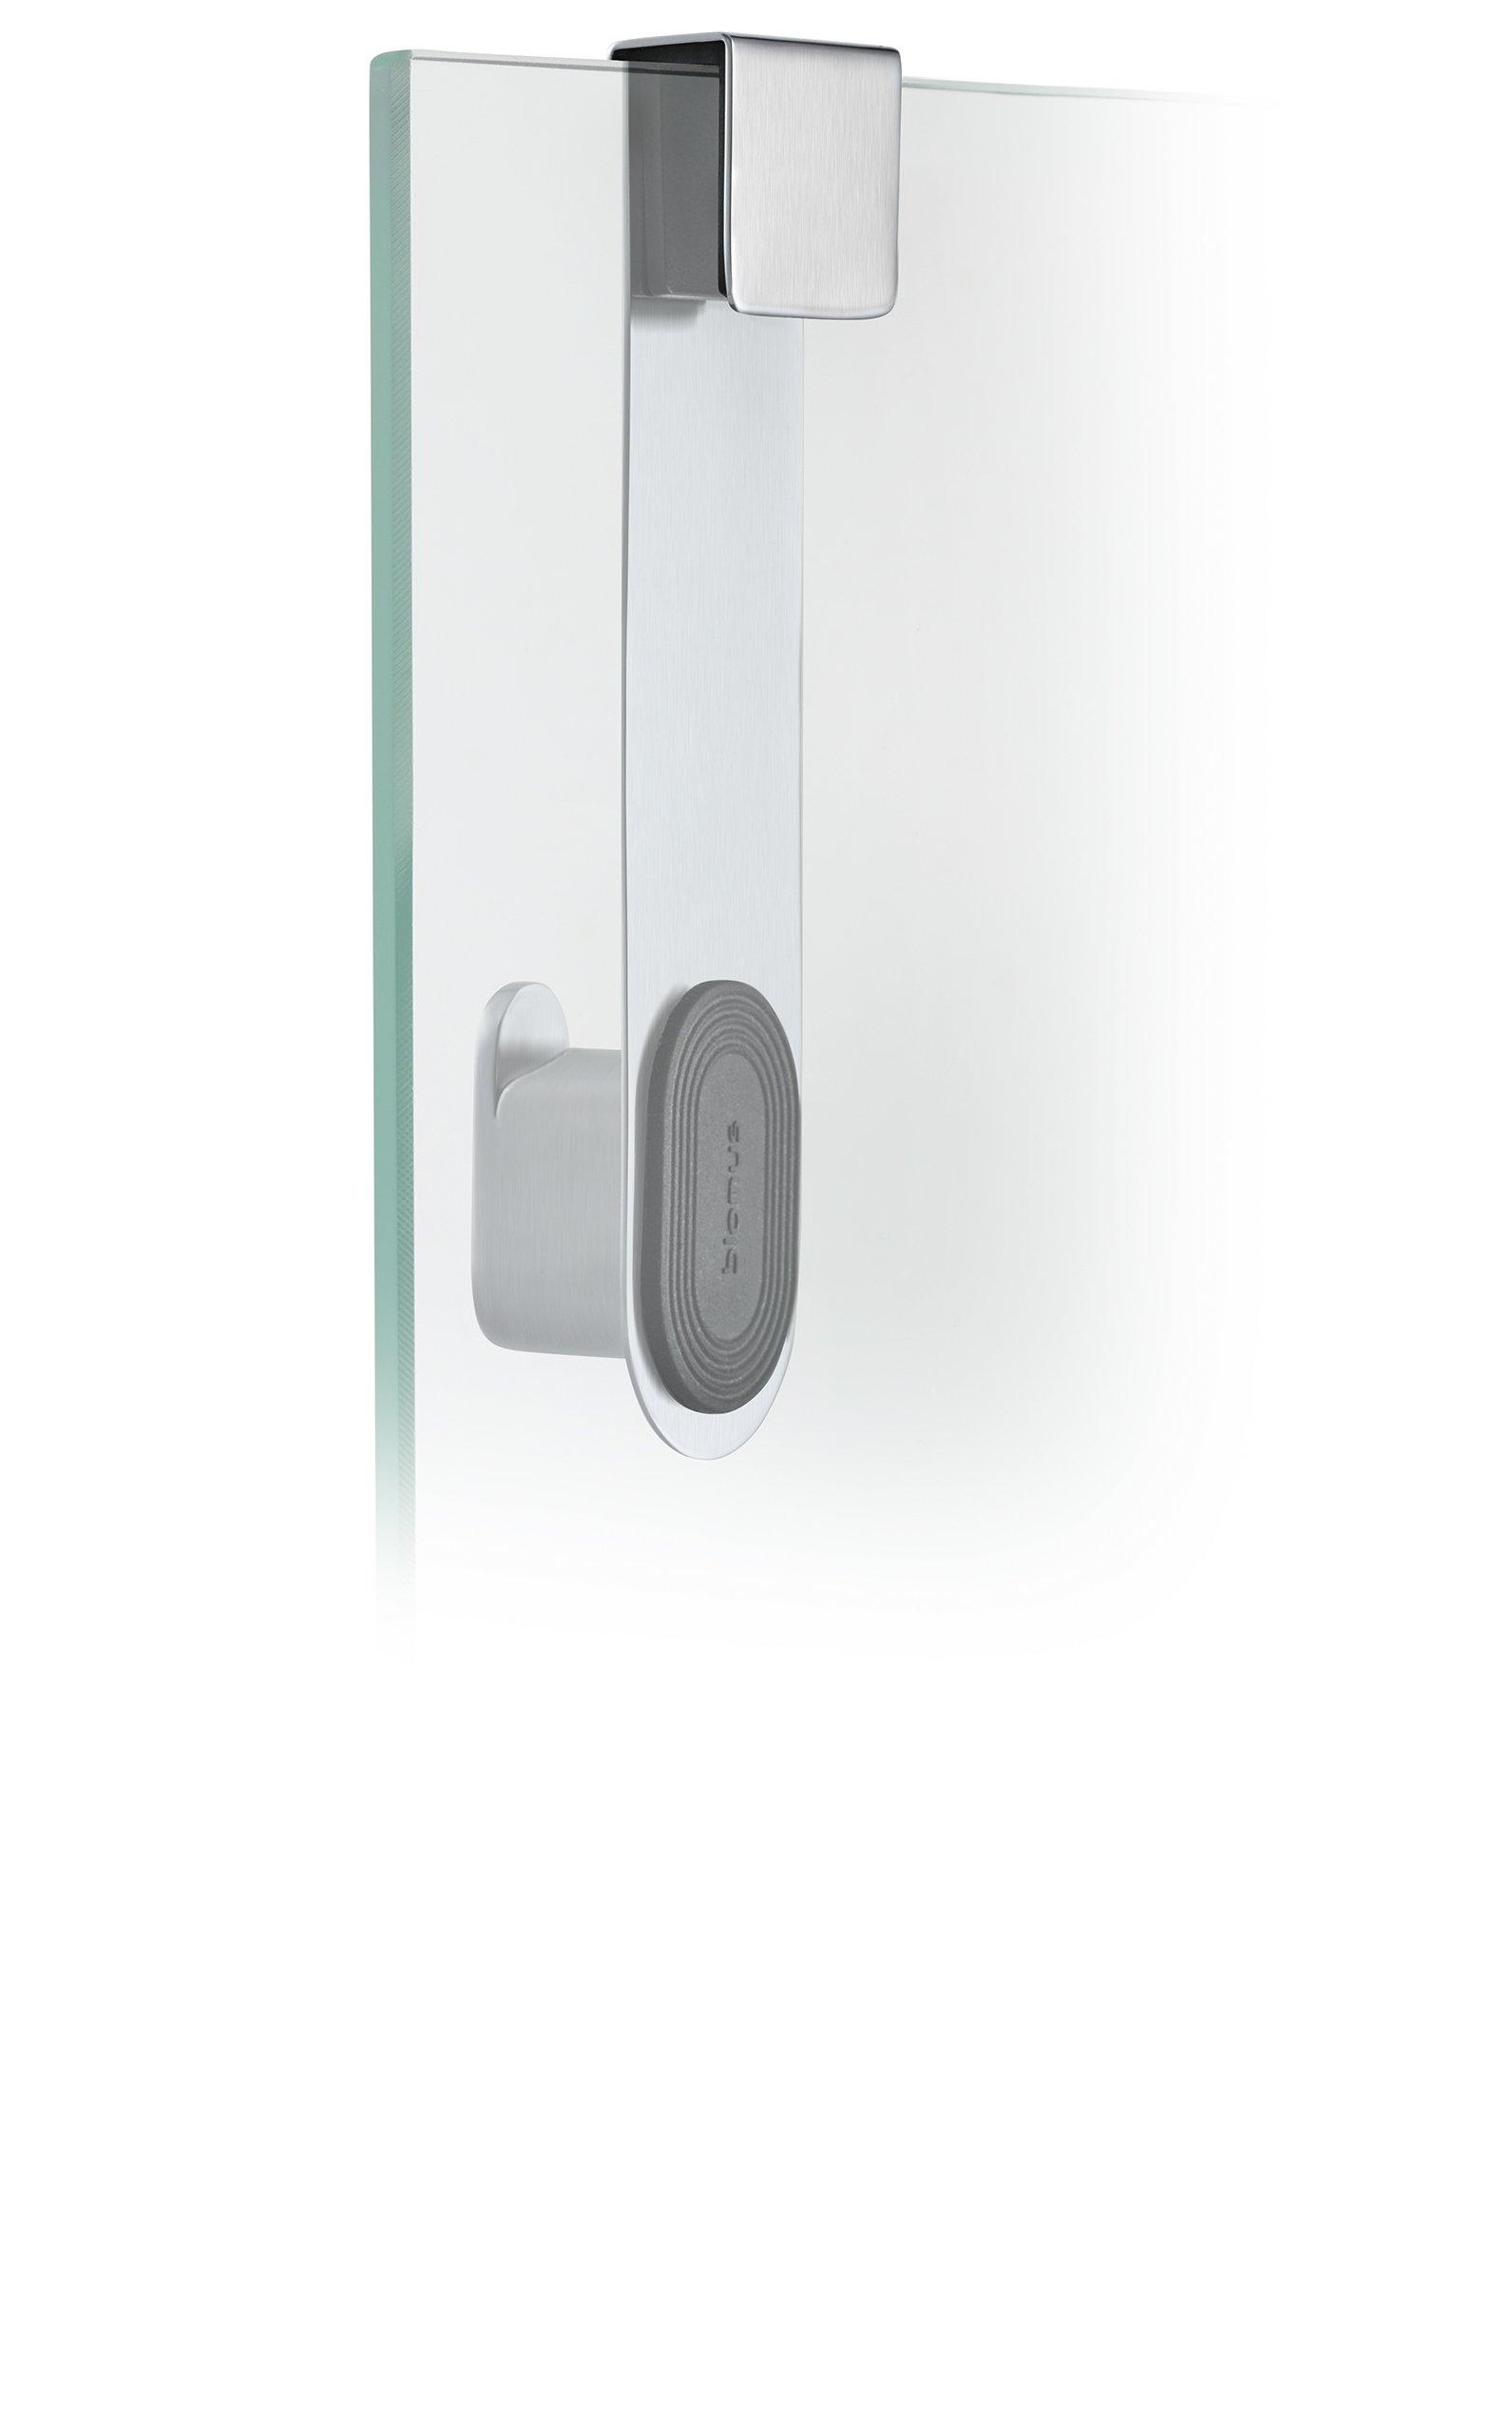 Blomus 68905 Areo Glass Door Shower Hook, Brushed by Blomus (Image #2)